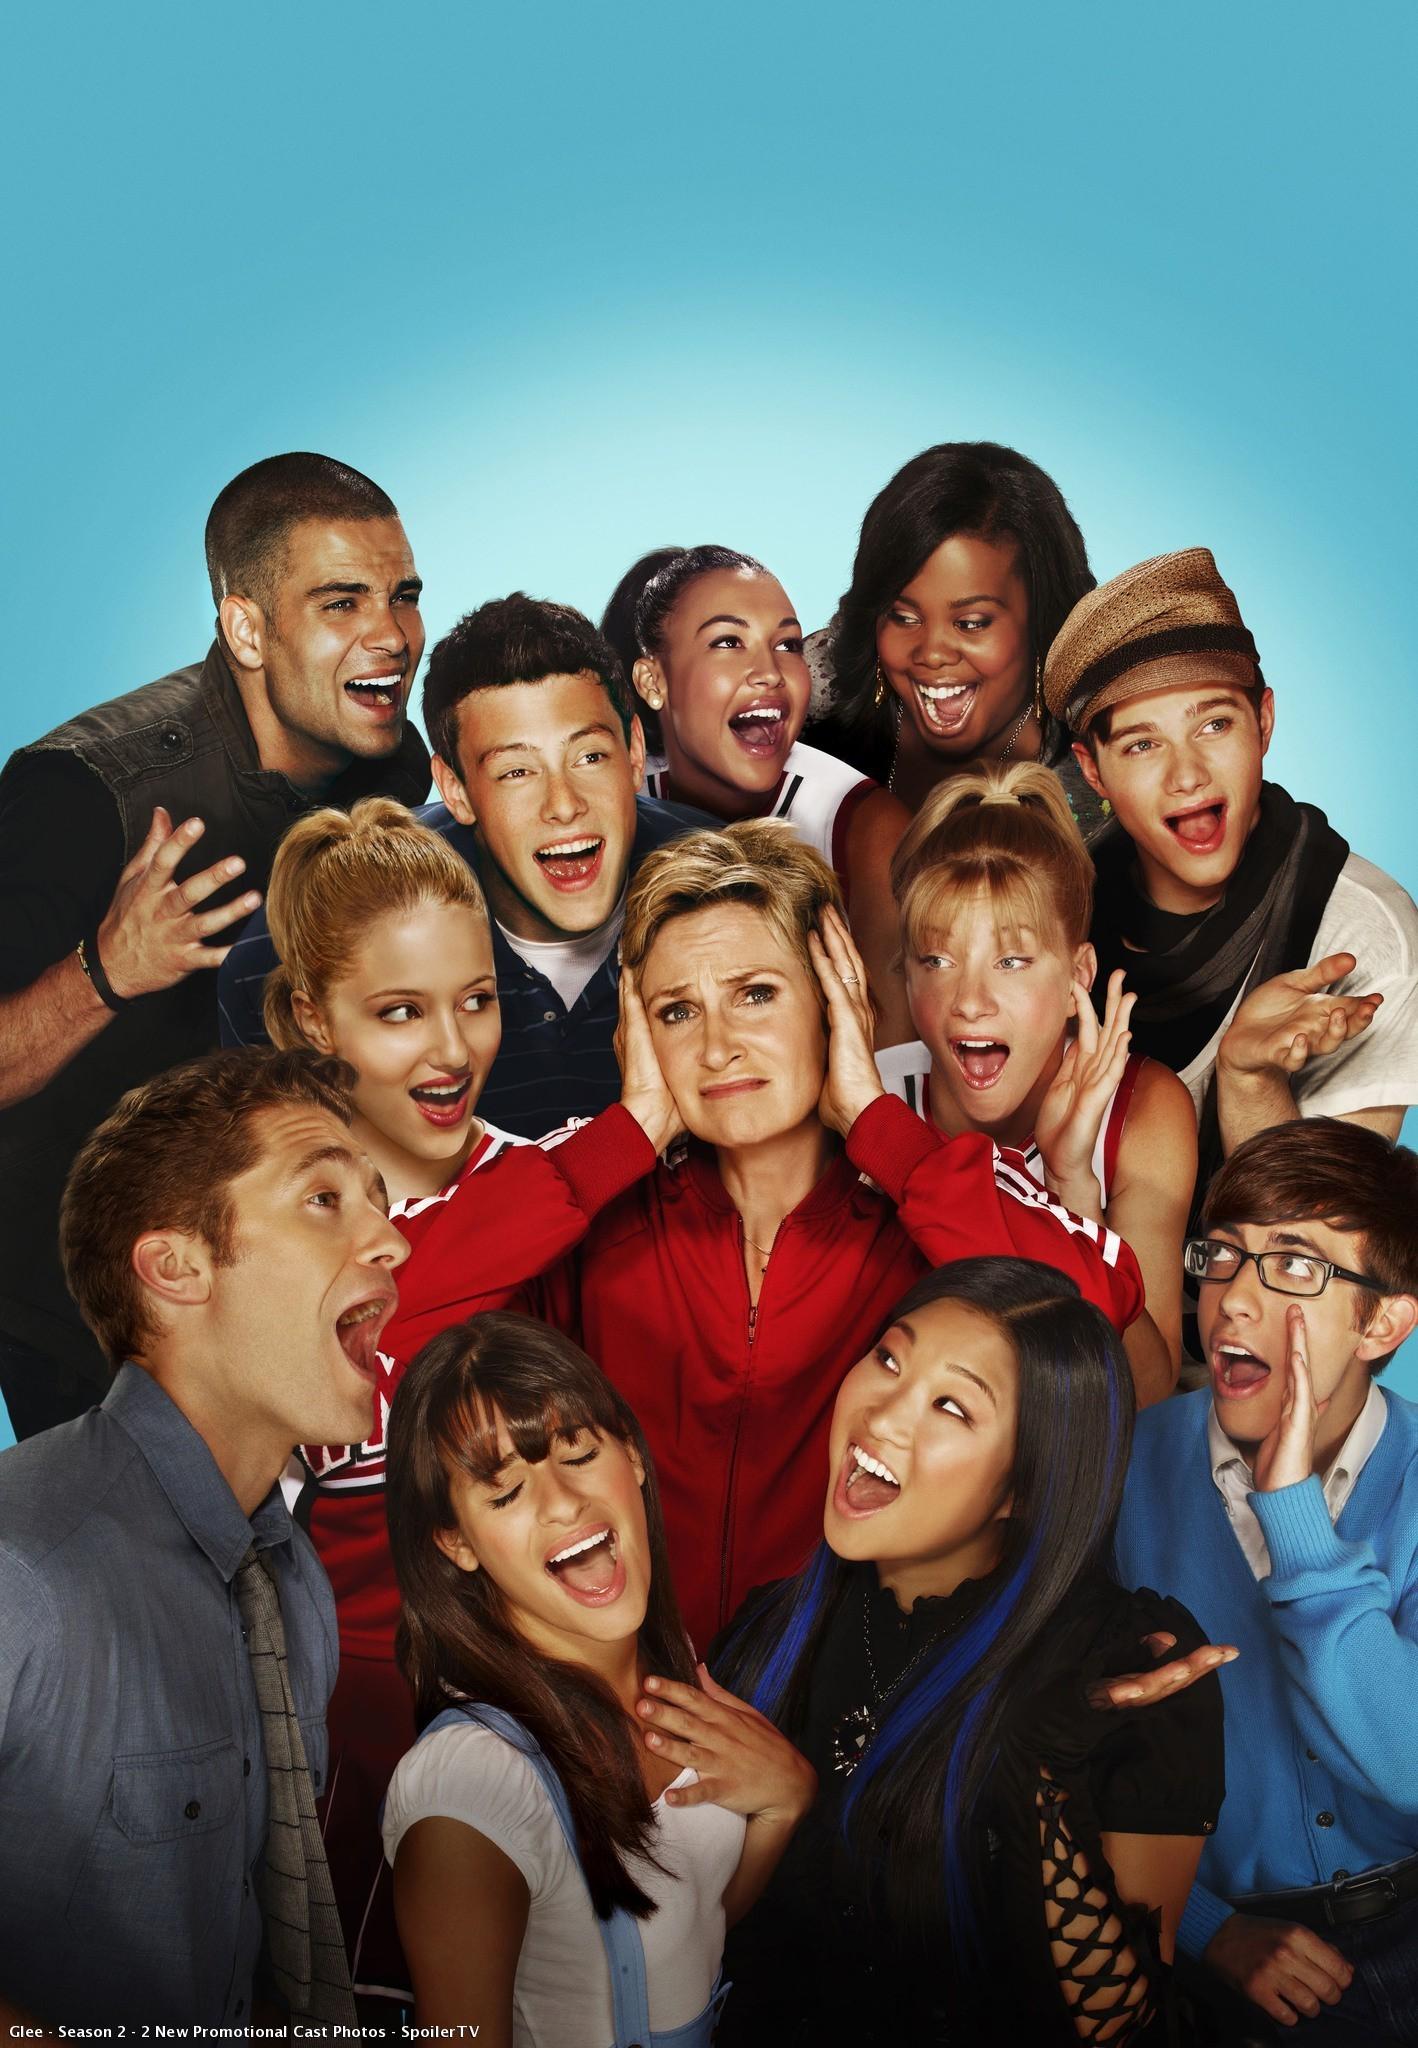 Image - Glee-Promo-Cast-Photos-glee-15731077-1418-2048 jpg